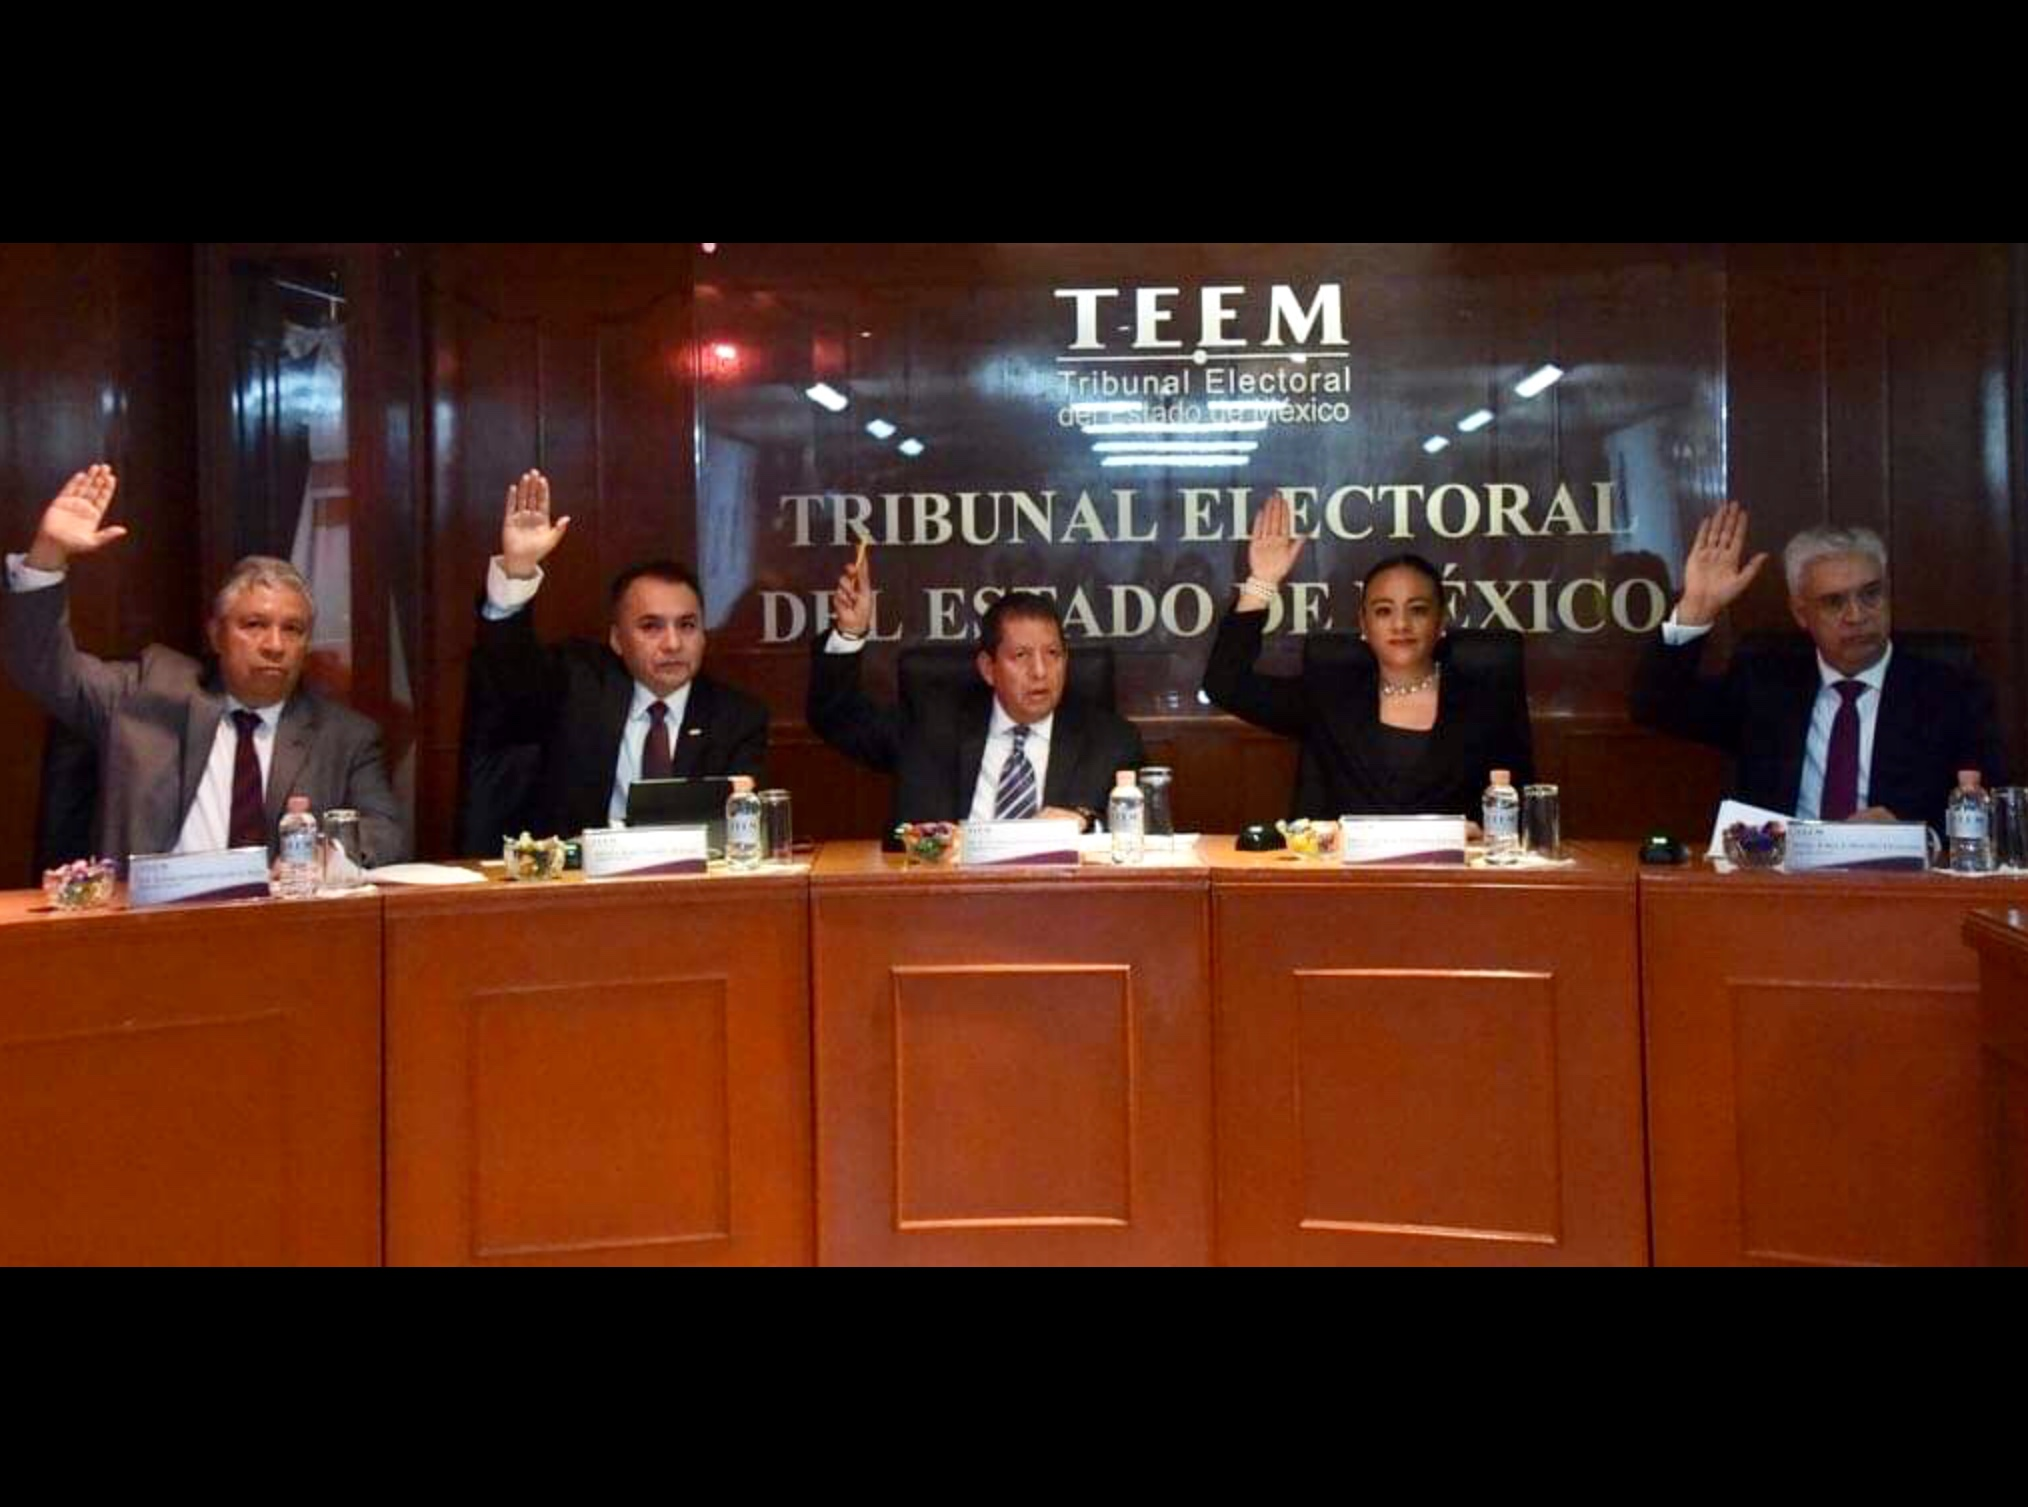 Tonanitla, a elección extraordinaria: TEEM